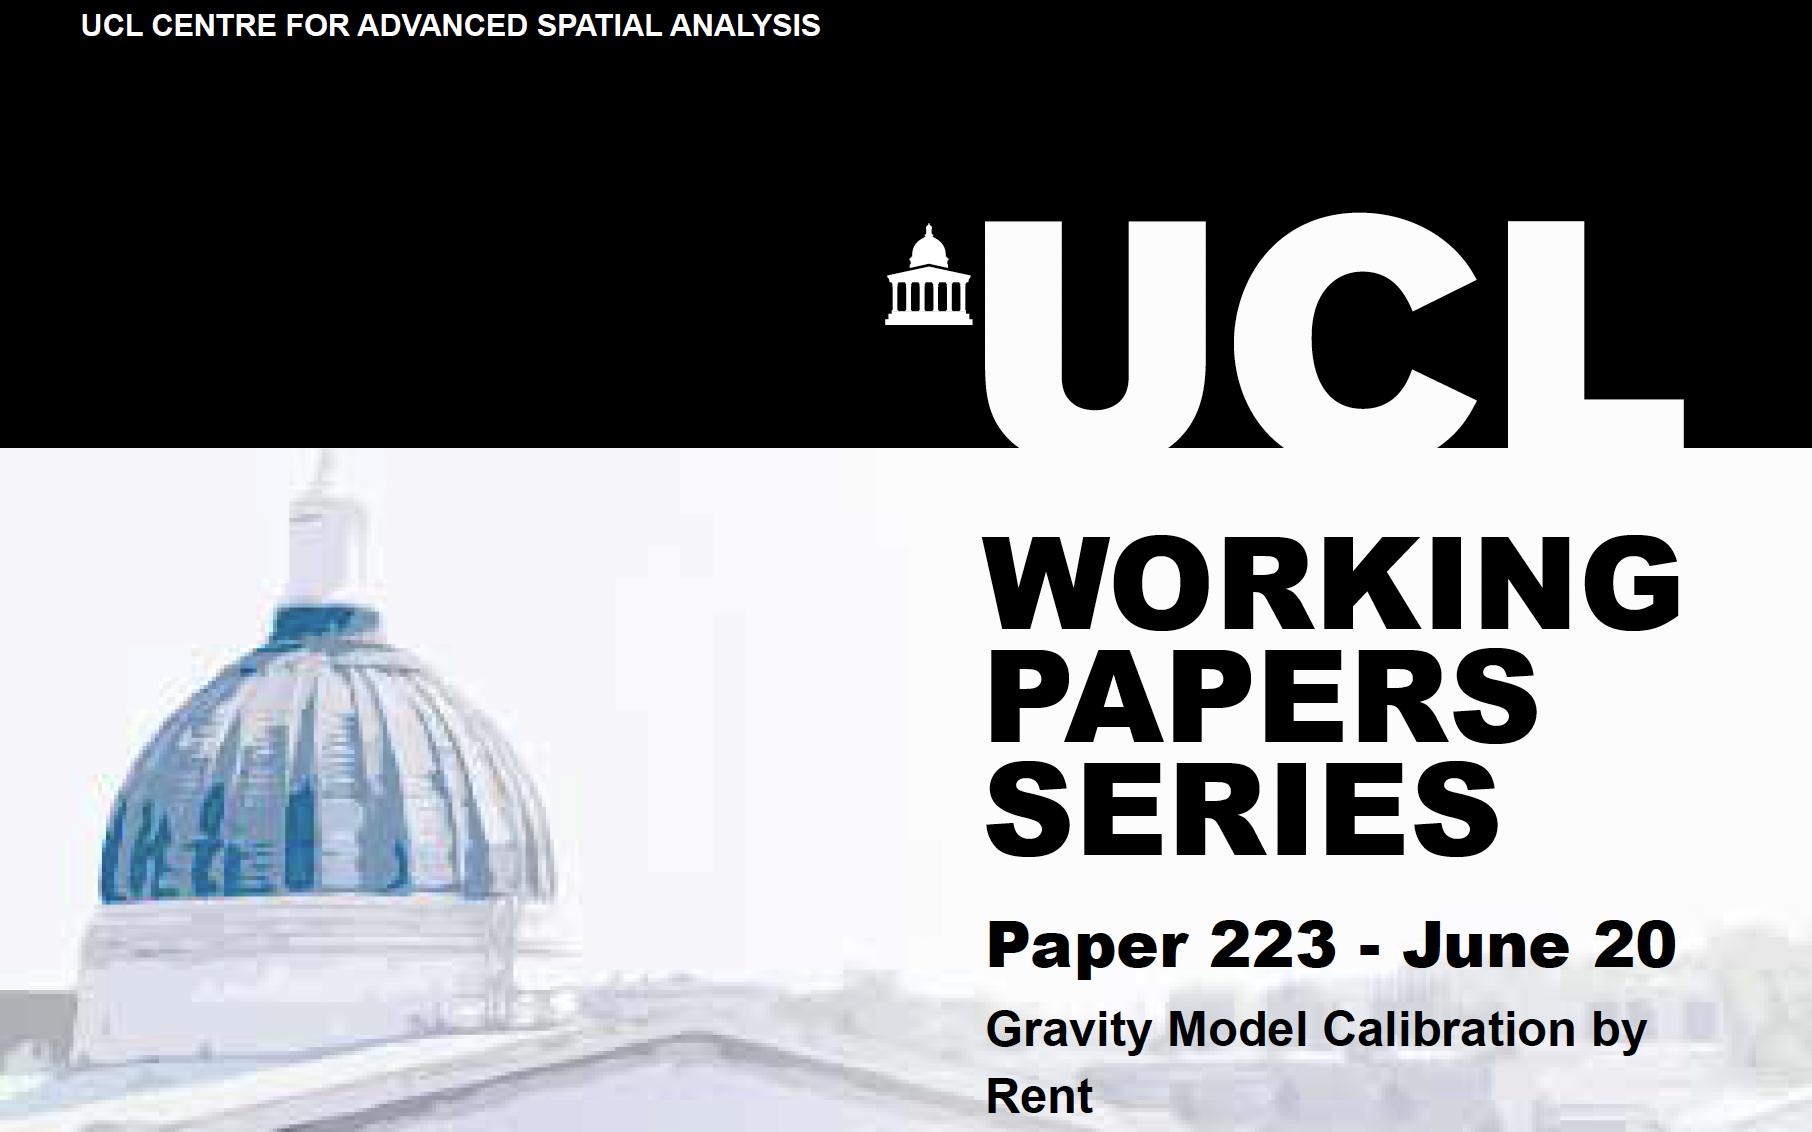 CASA Working Paper 223